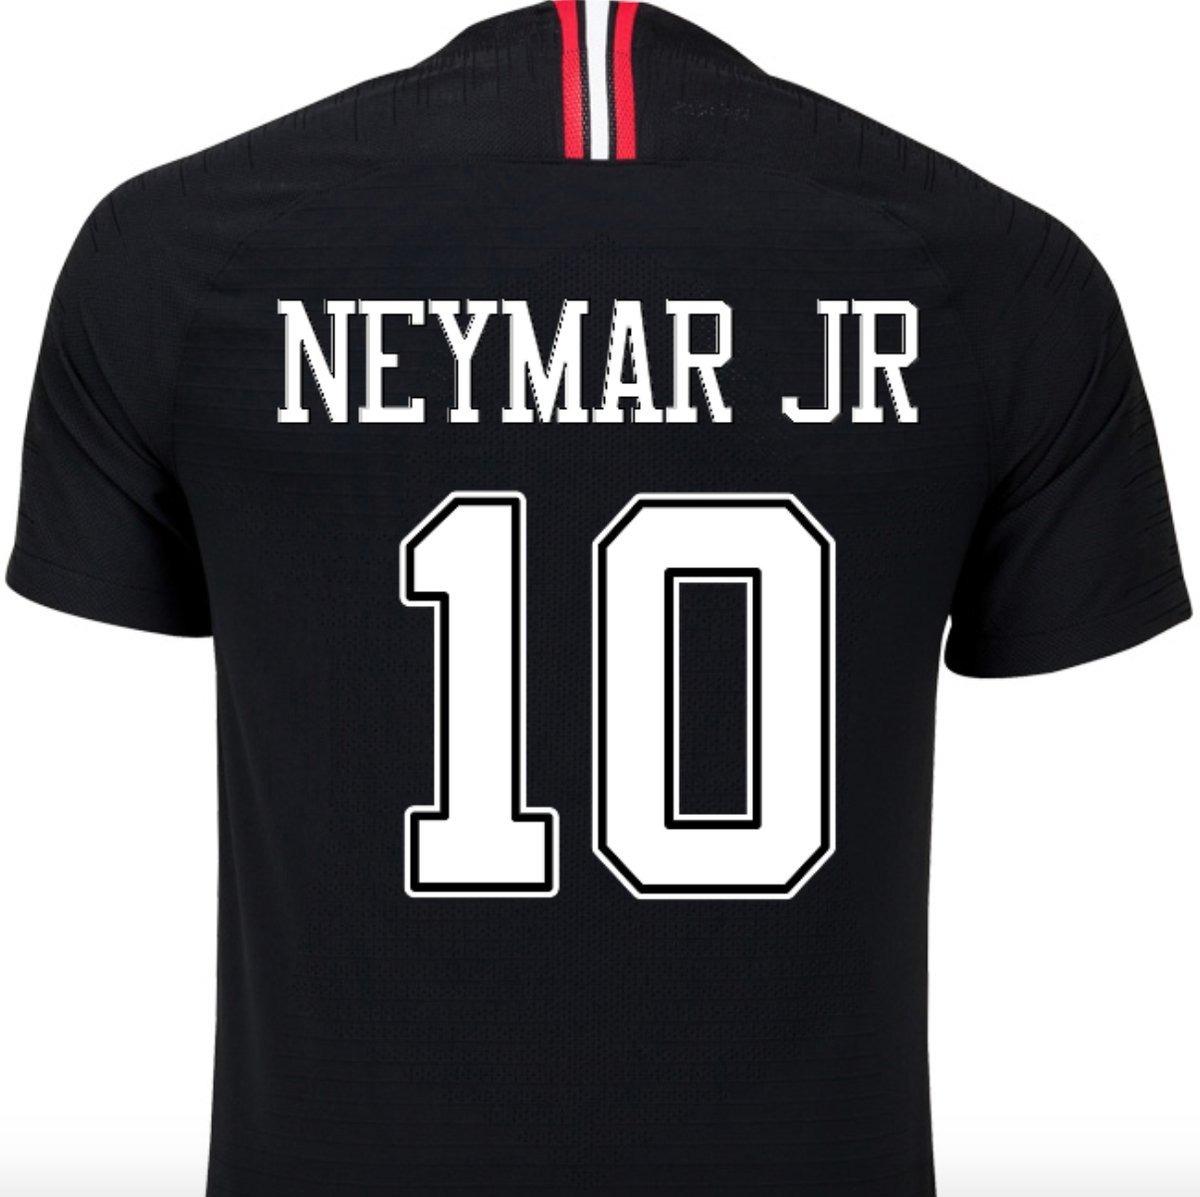 13b774e82 Camisa Psg Jordan 18-19 ( Neymar Jr Mbappé ) Personalizada - R  165 ...